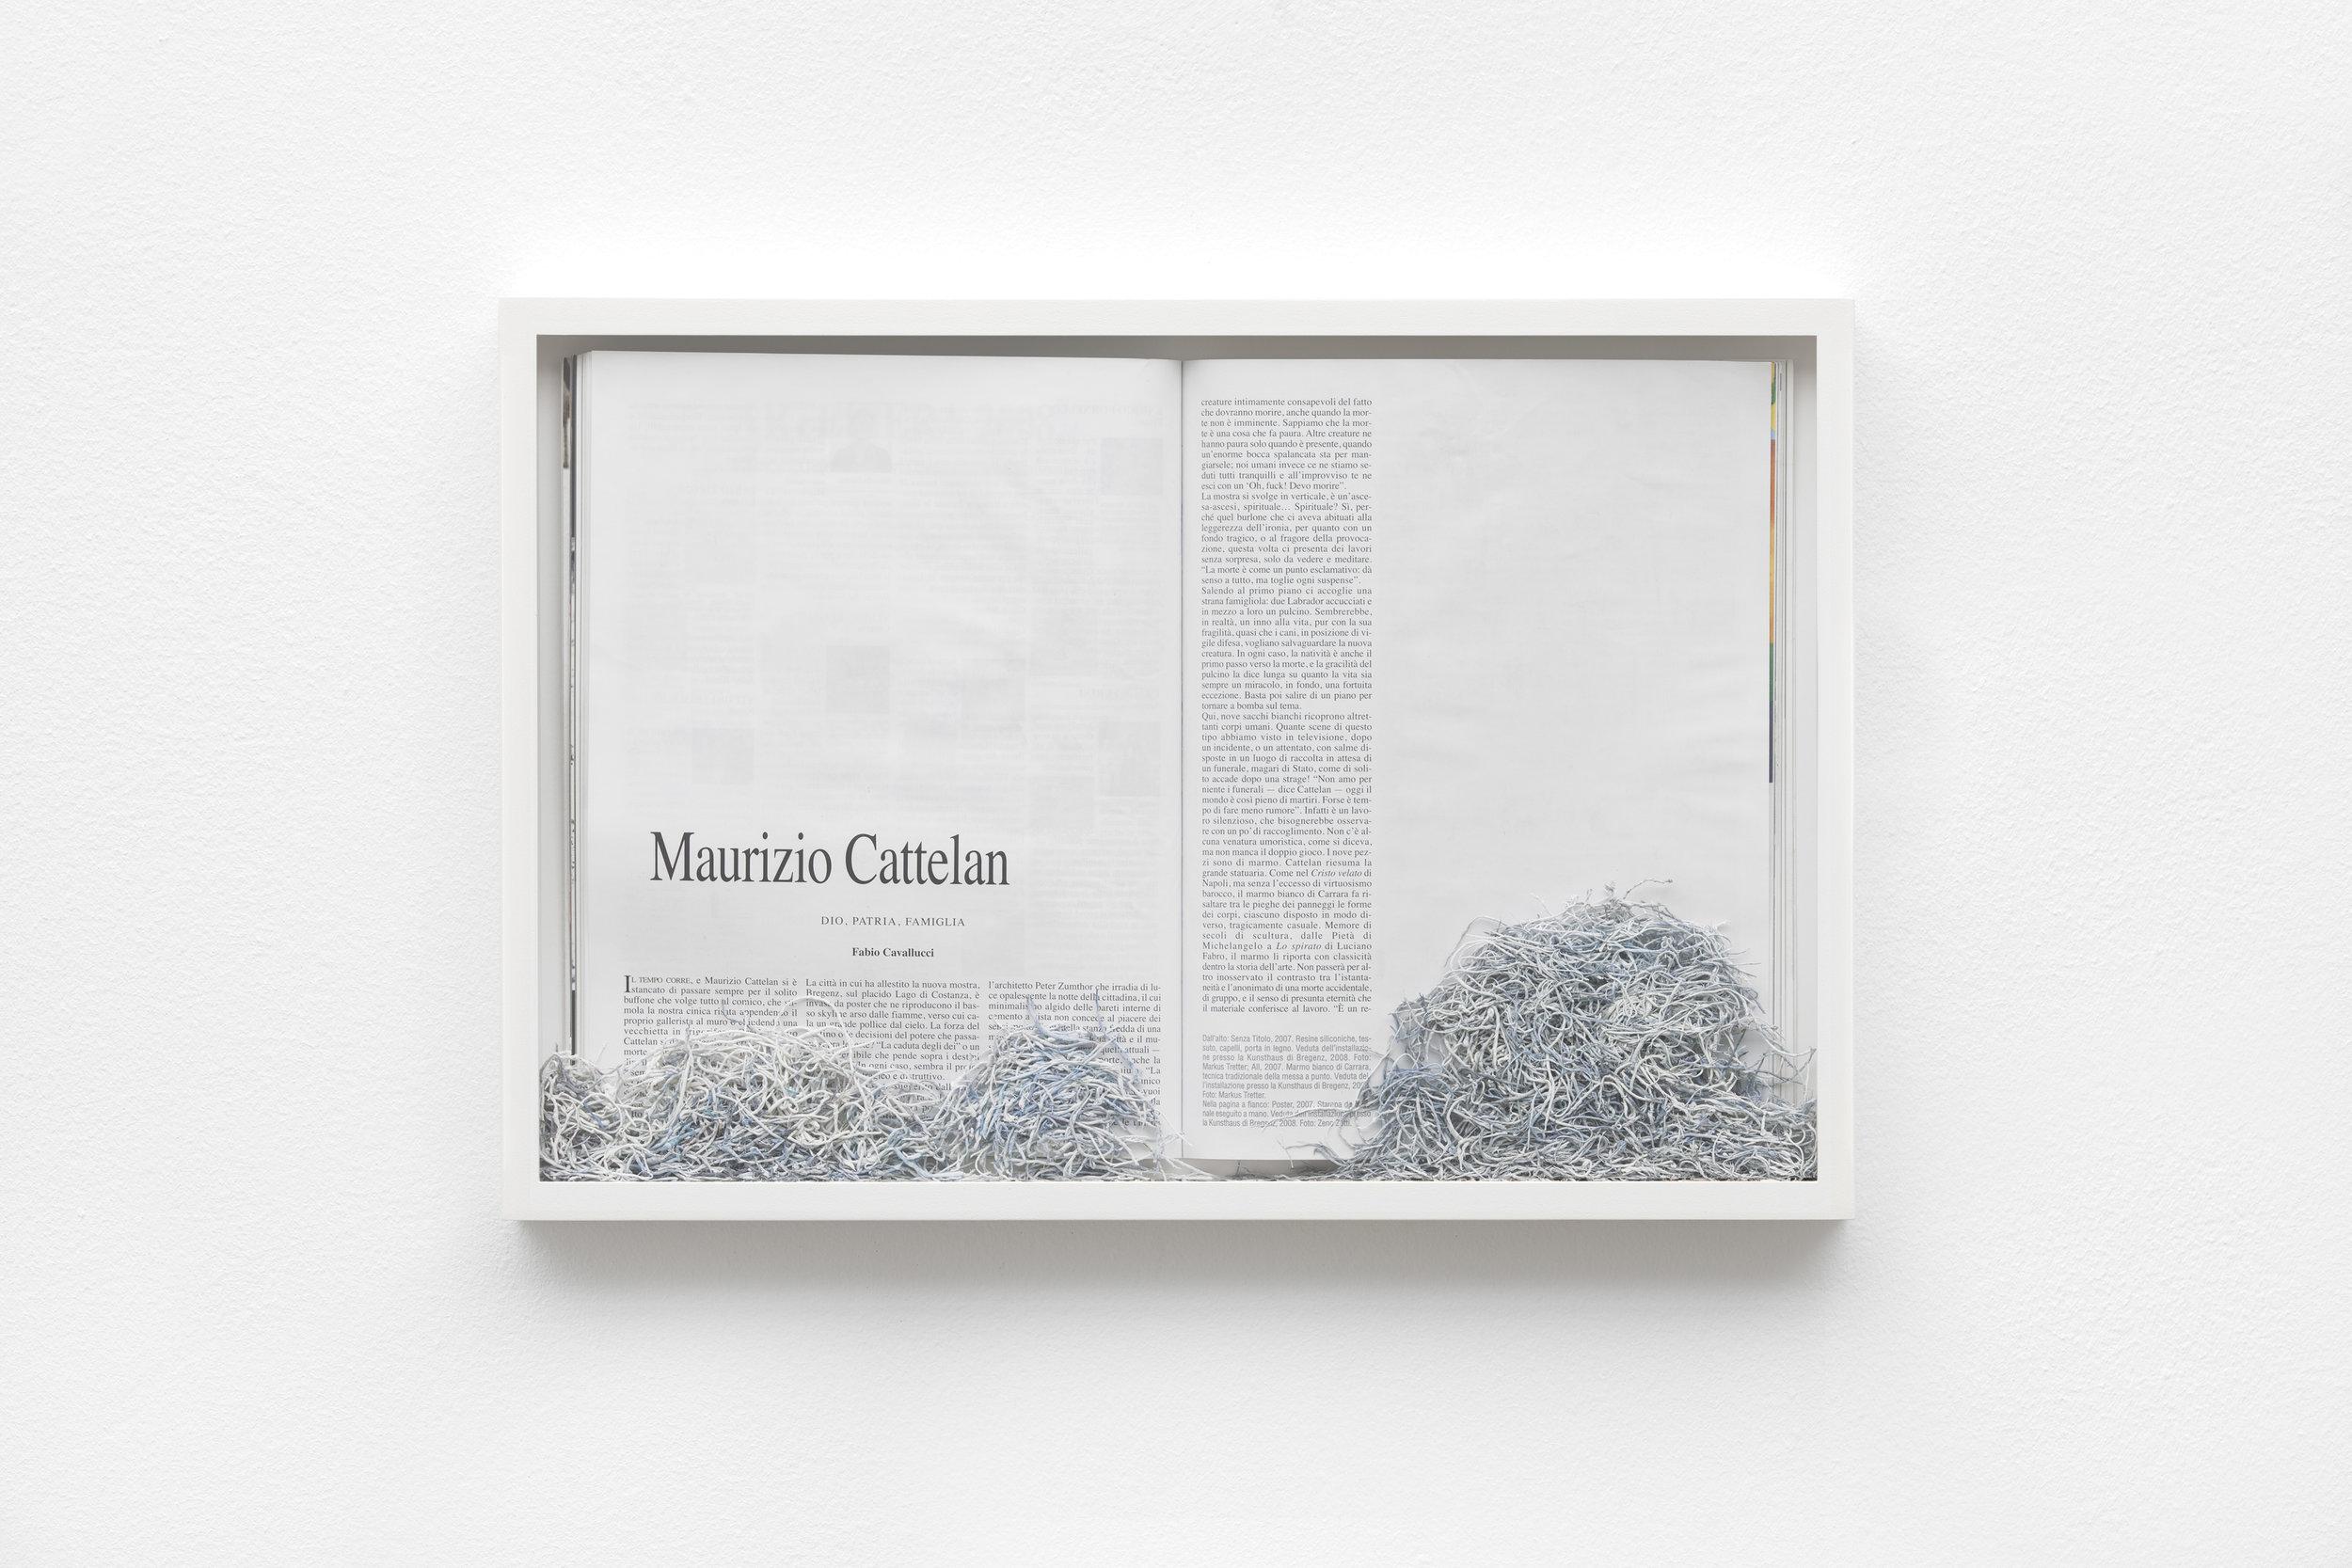 Maria Anwander  Erased Cattelan , 2016 Framed magazine and eraser abrasion, 31 x 45,5 cm